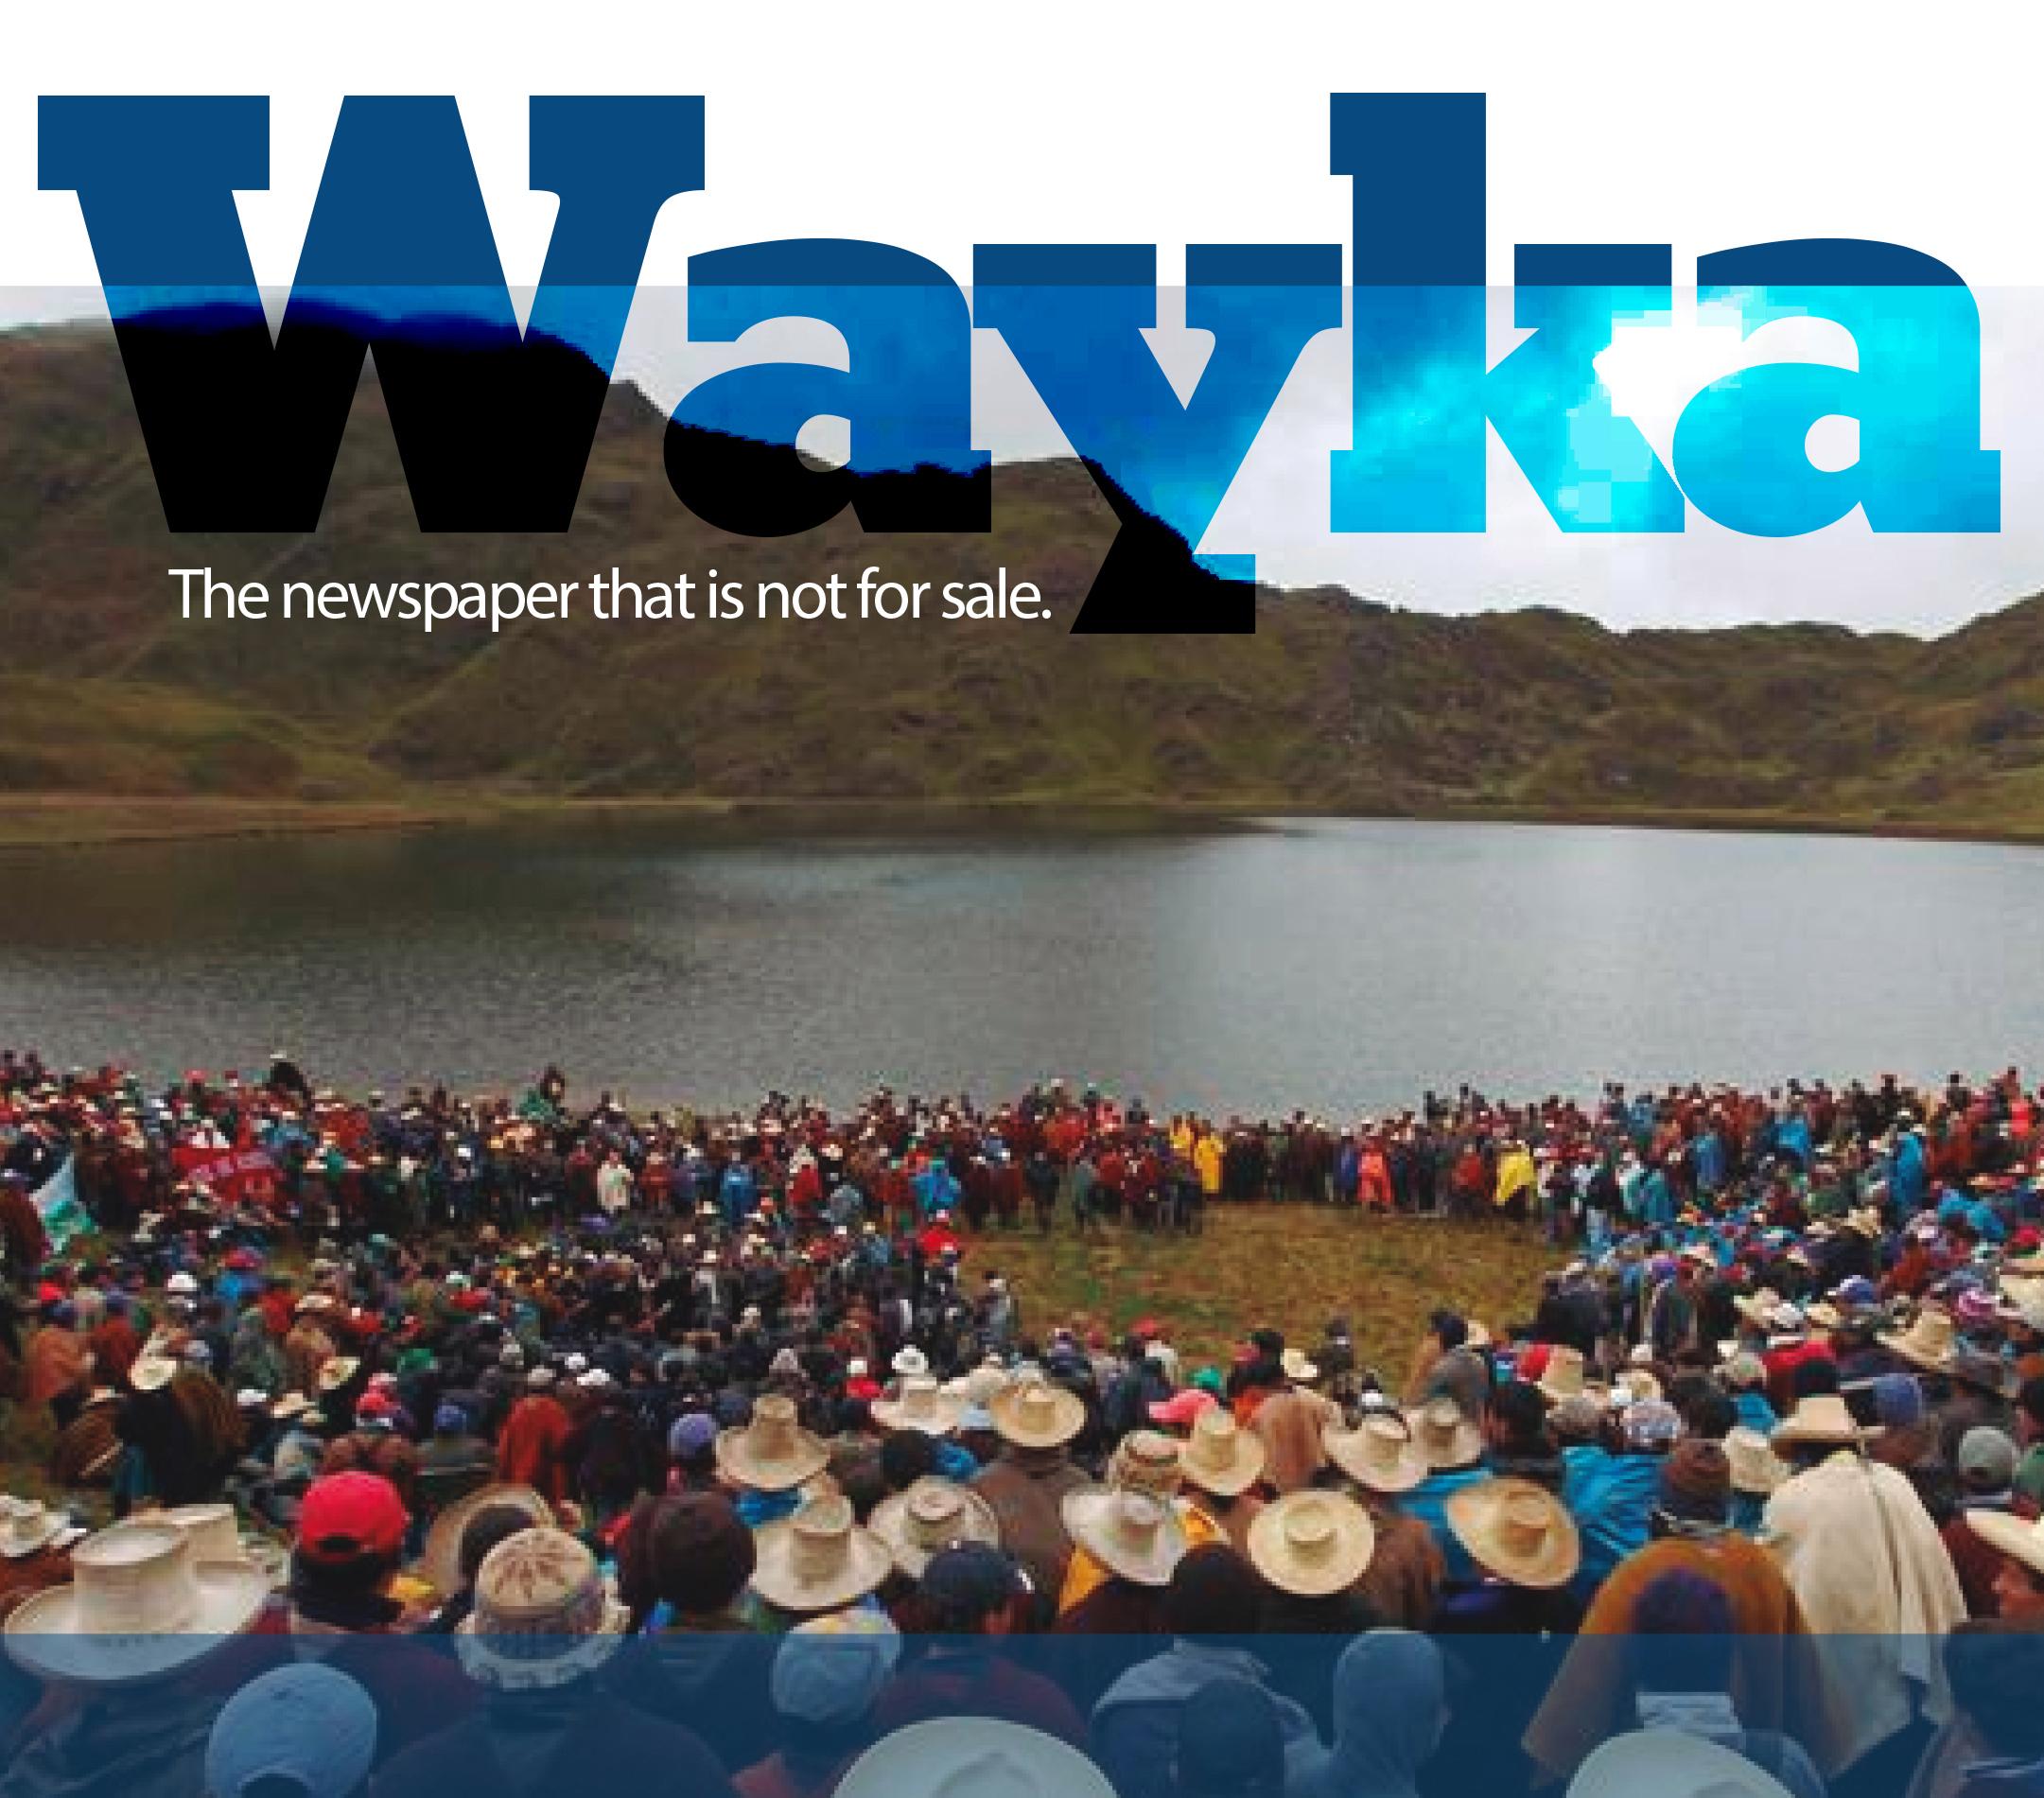 WaykaPortadaFB6